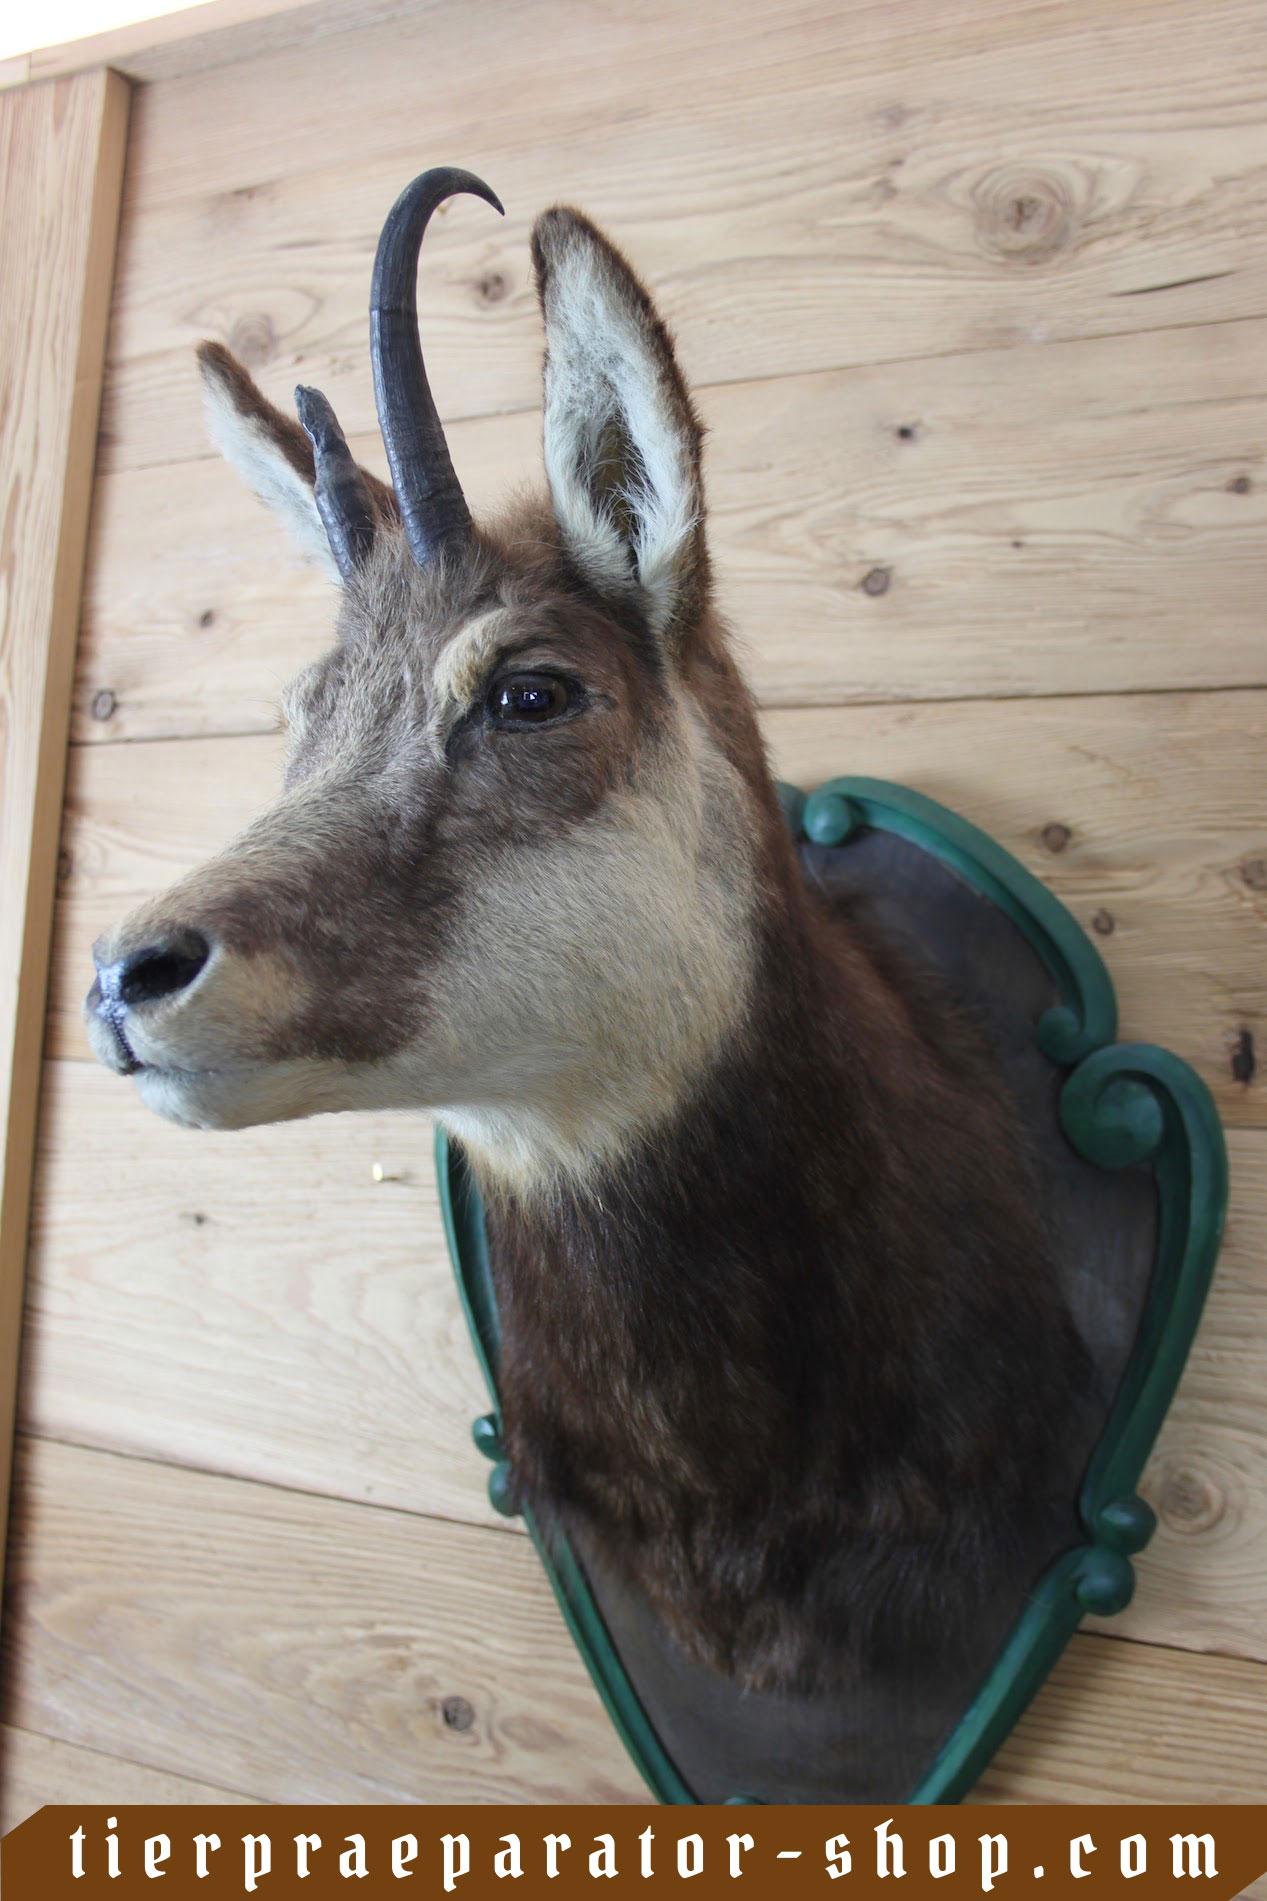 Tierpraeparator-Shop.com-Tierpraeparate-kaufen-173